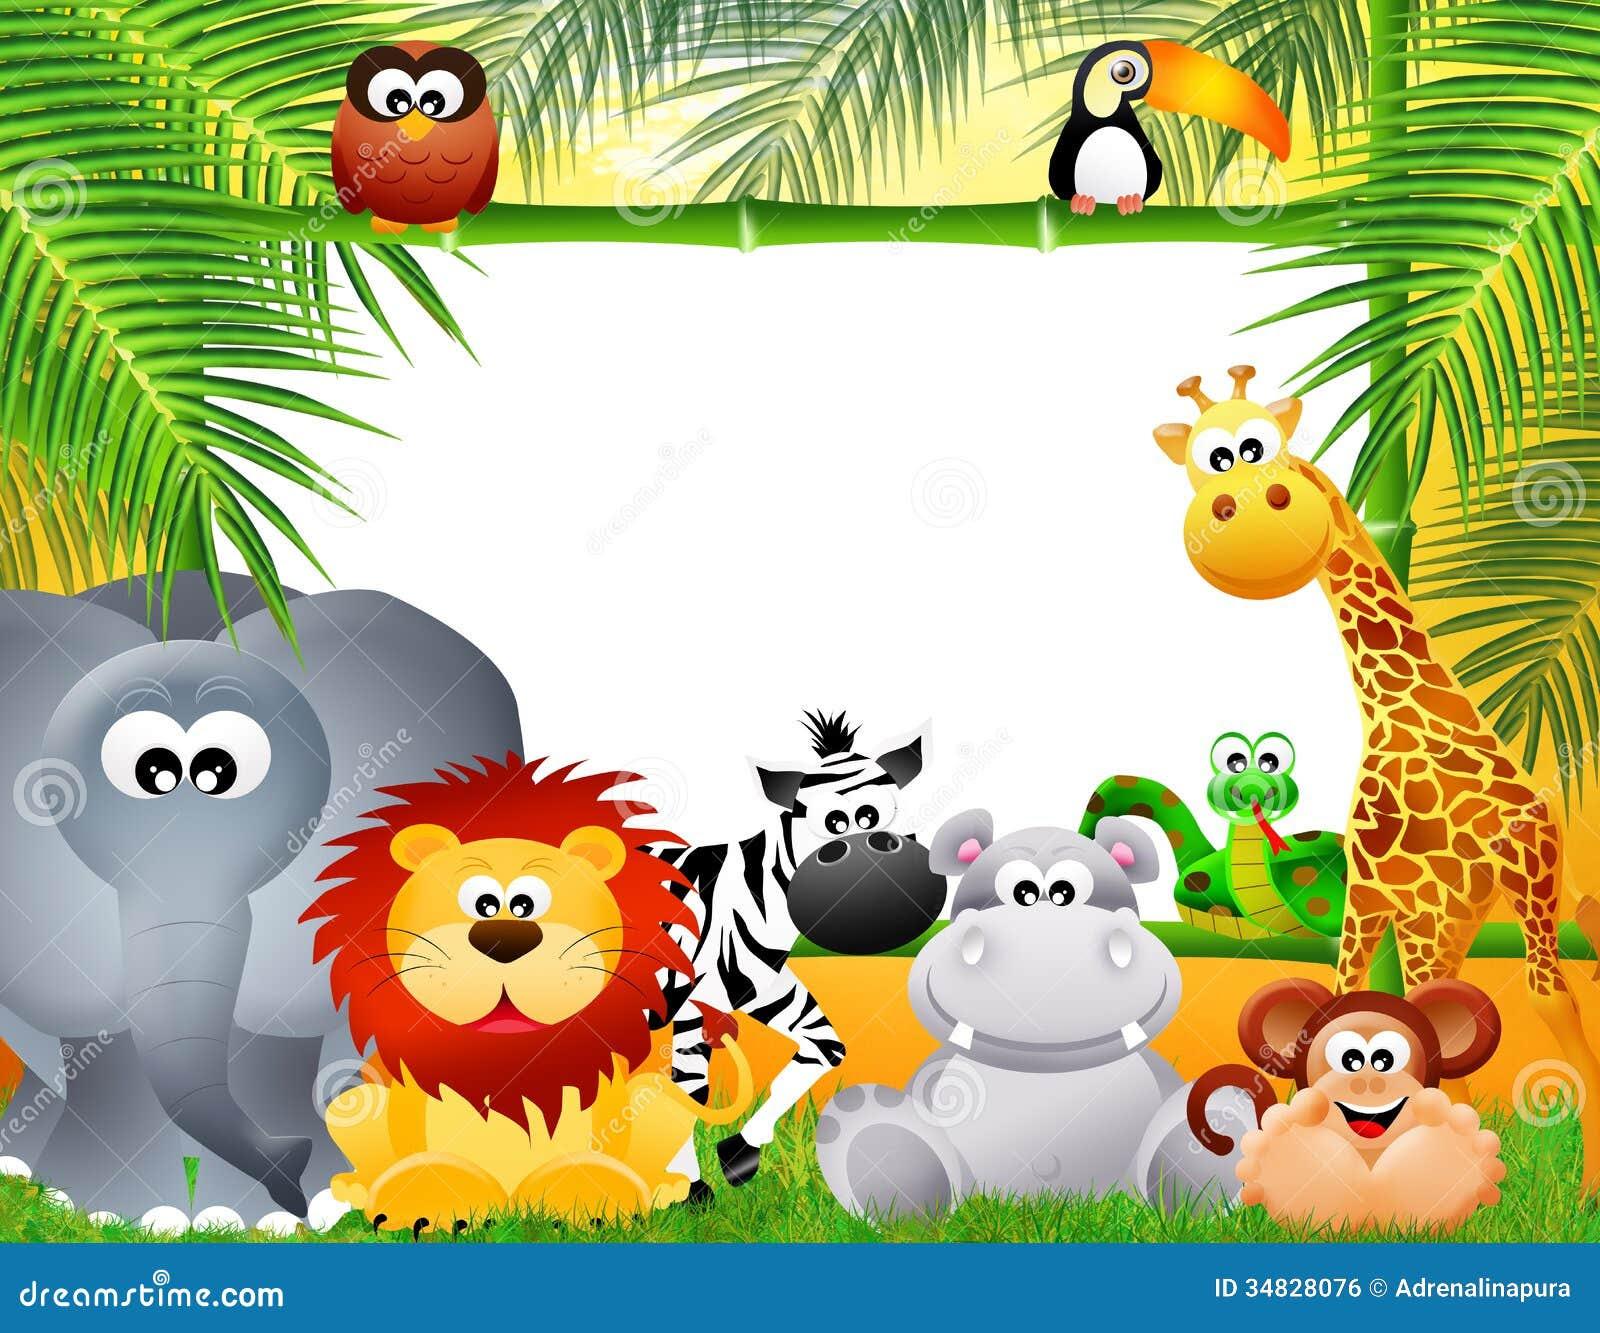 Download 61+ Gambar Kartun Zoo Keren Gratis